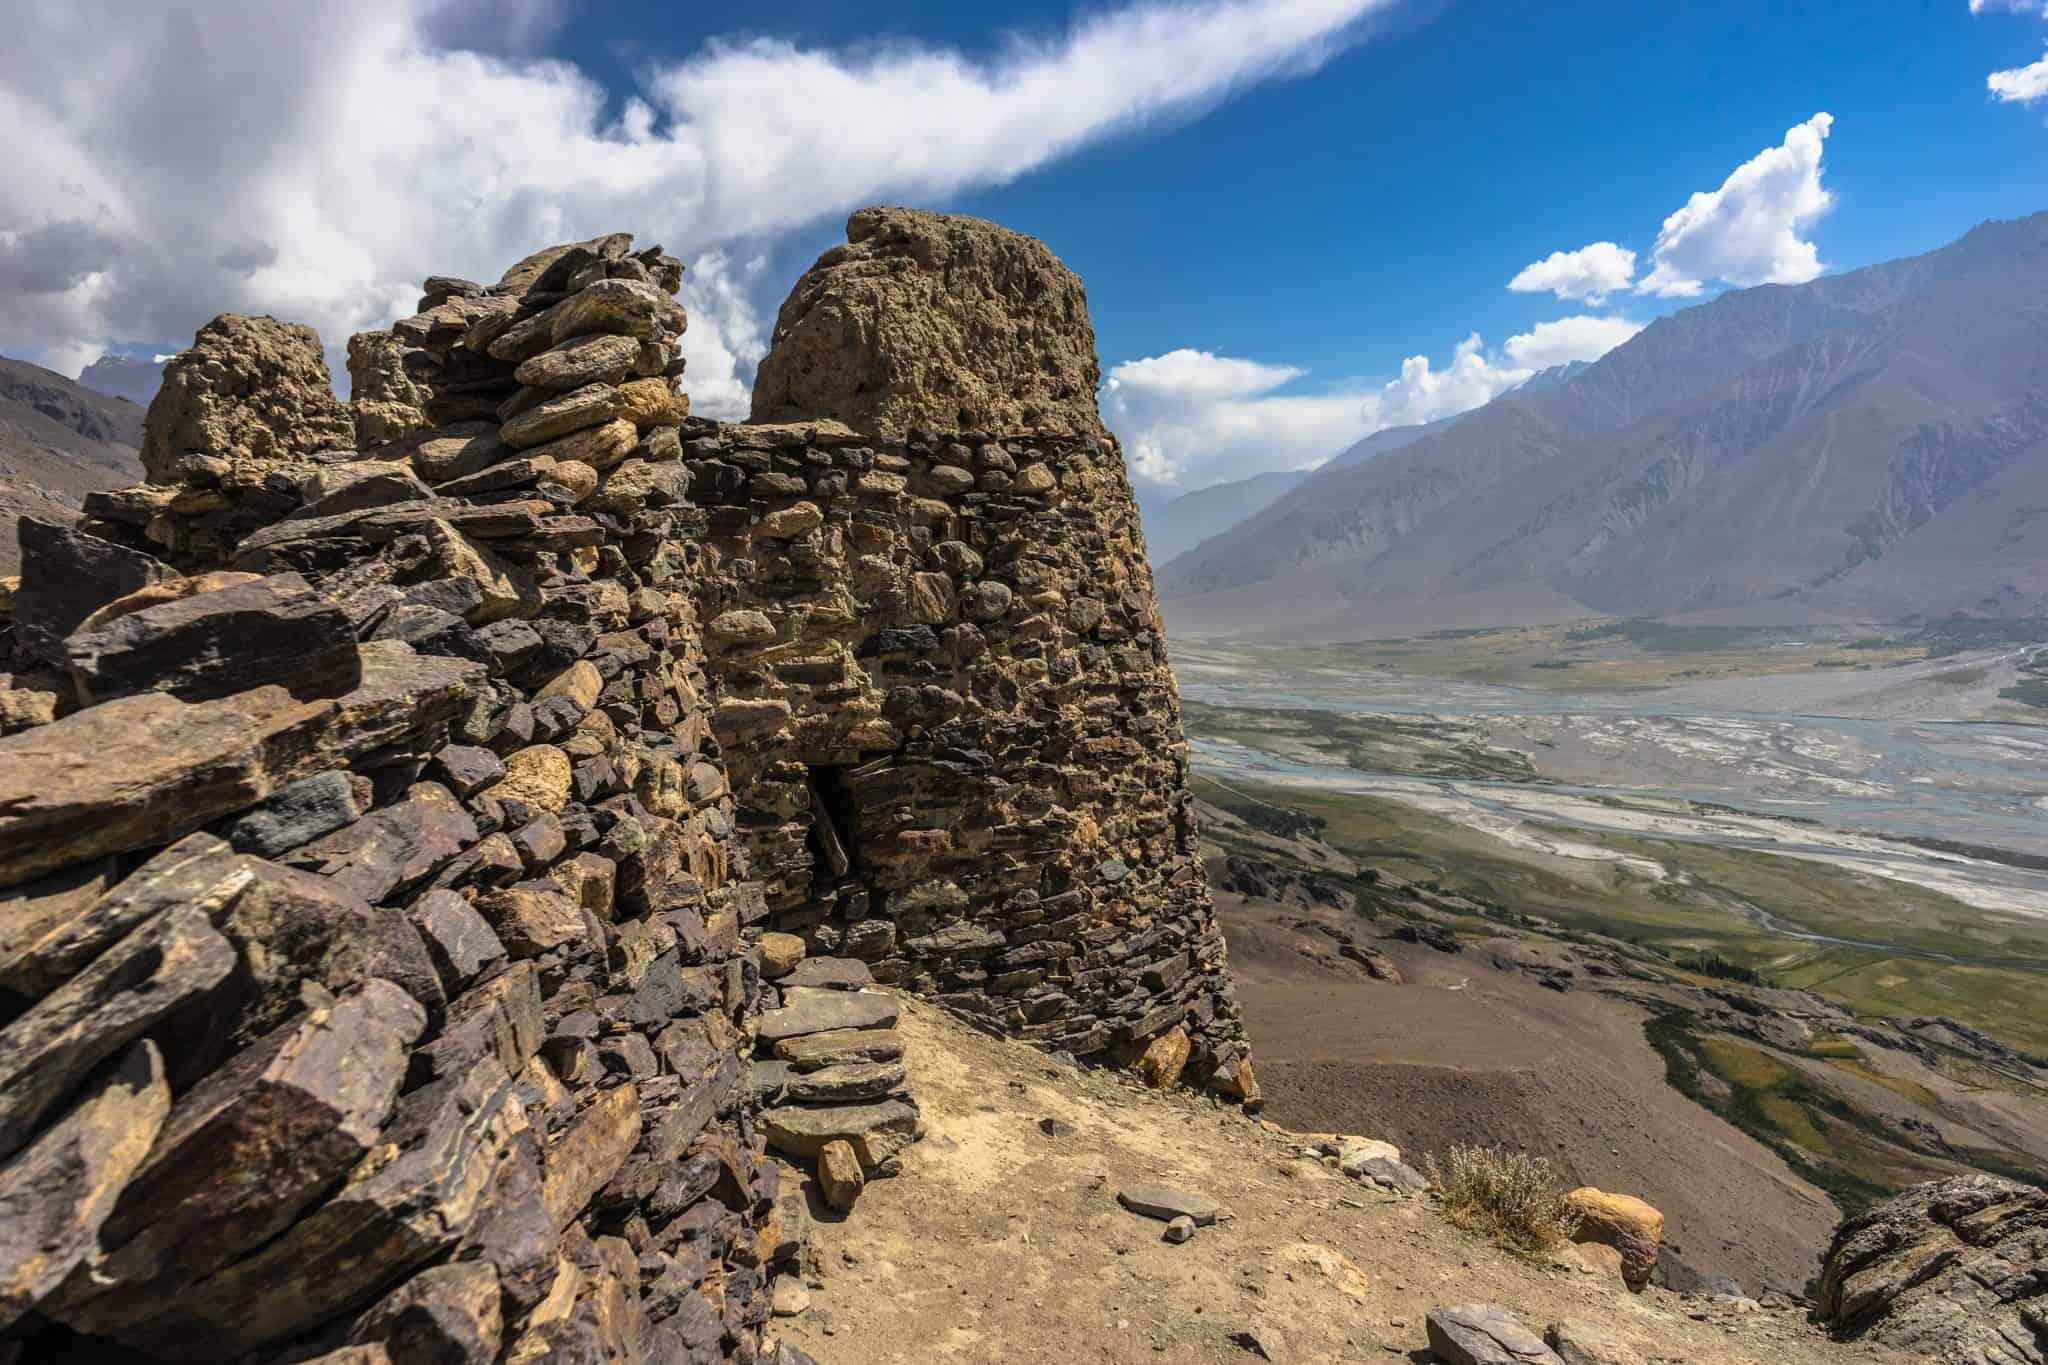 Yamchun Fort Silk Road Photo Journey